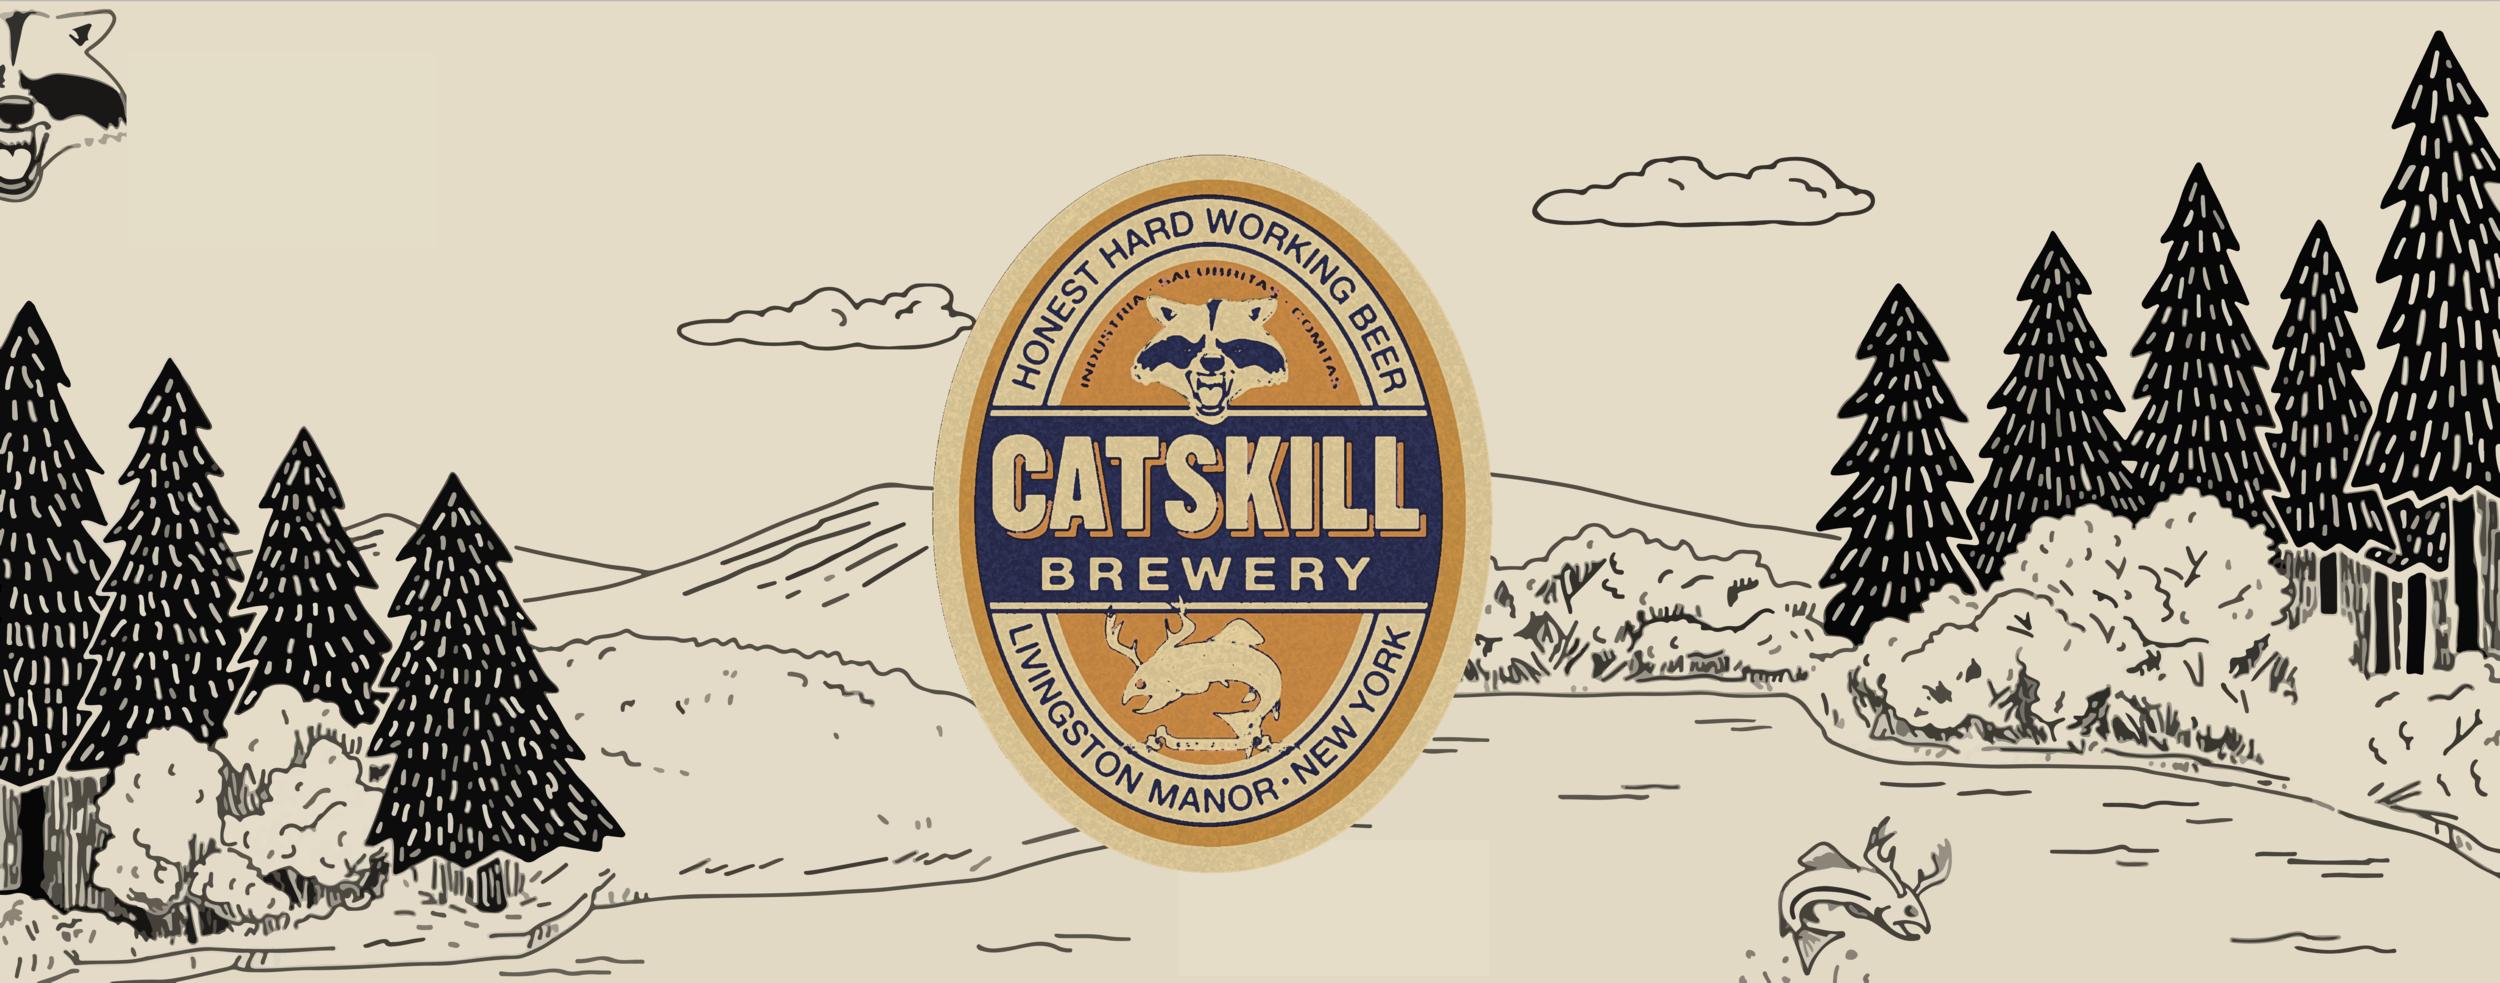 Catskill Brewery@3x.png